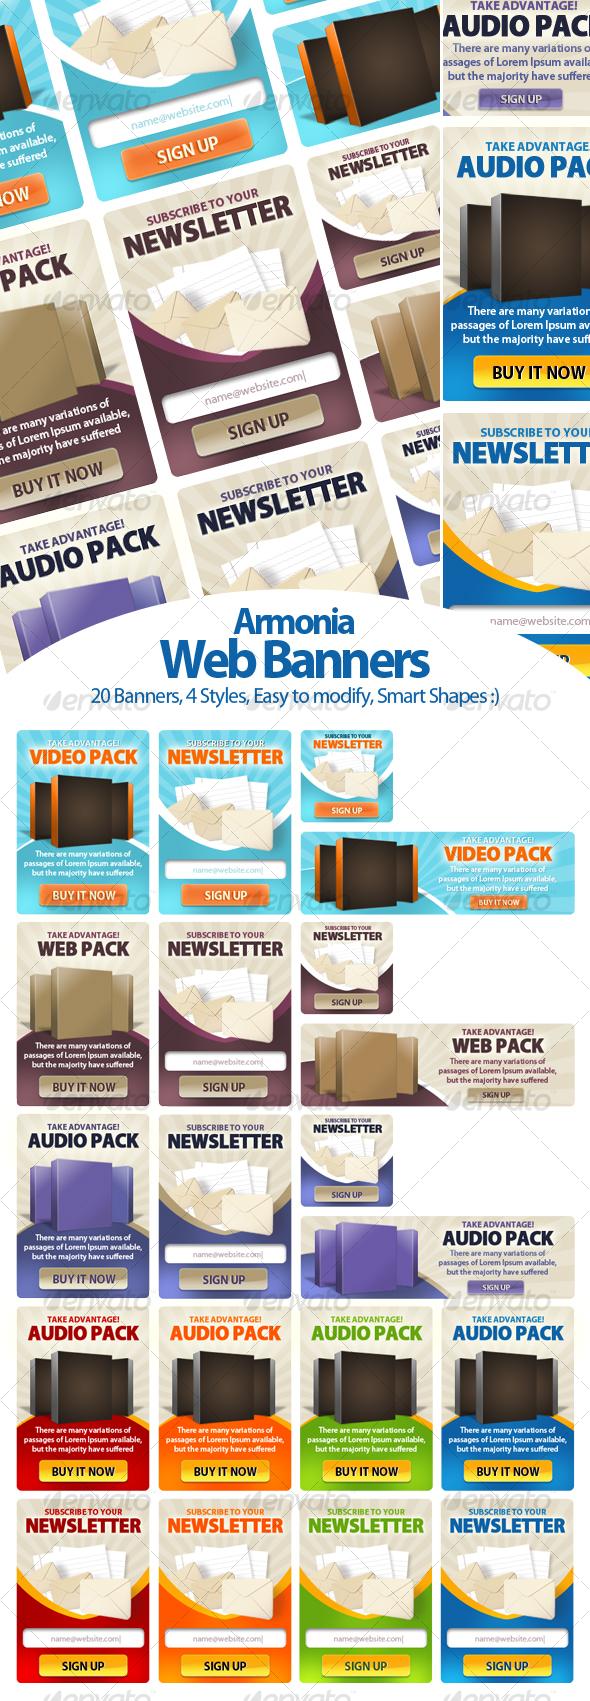 GraphicRiver Armonia Web Banners 53157